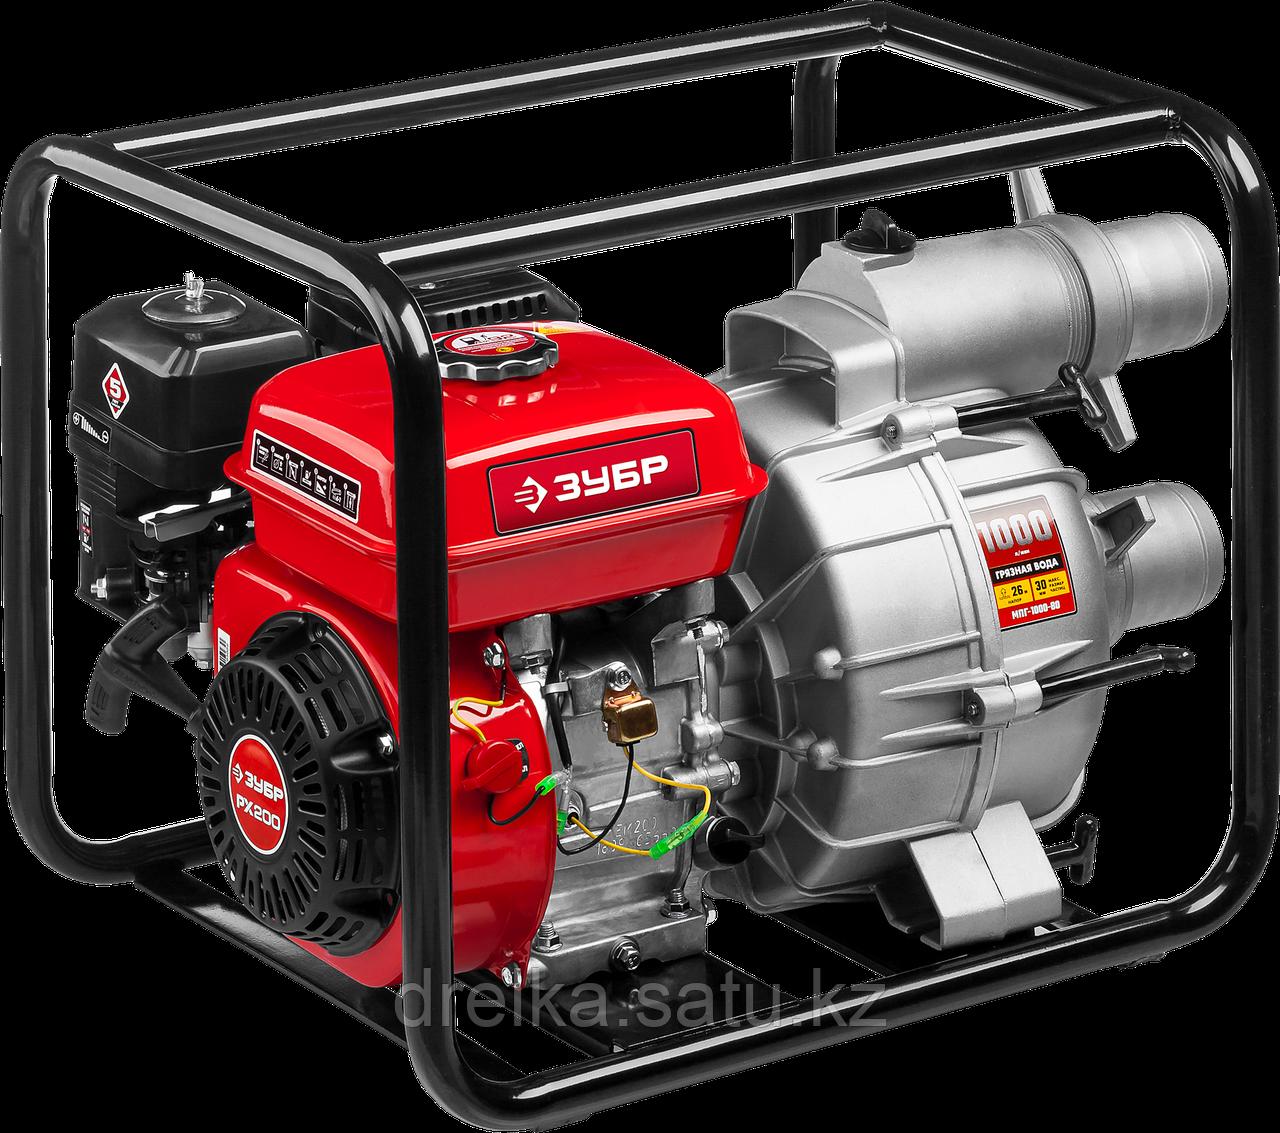 Мотопомпа бензиновая, ЗУБР МПГ-1000-80, для грязной воды, 1000 л/мин (60 м3/ч), патрубки 80 мм, напор 26 м